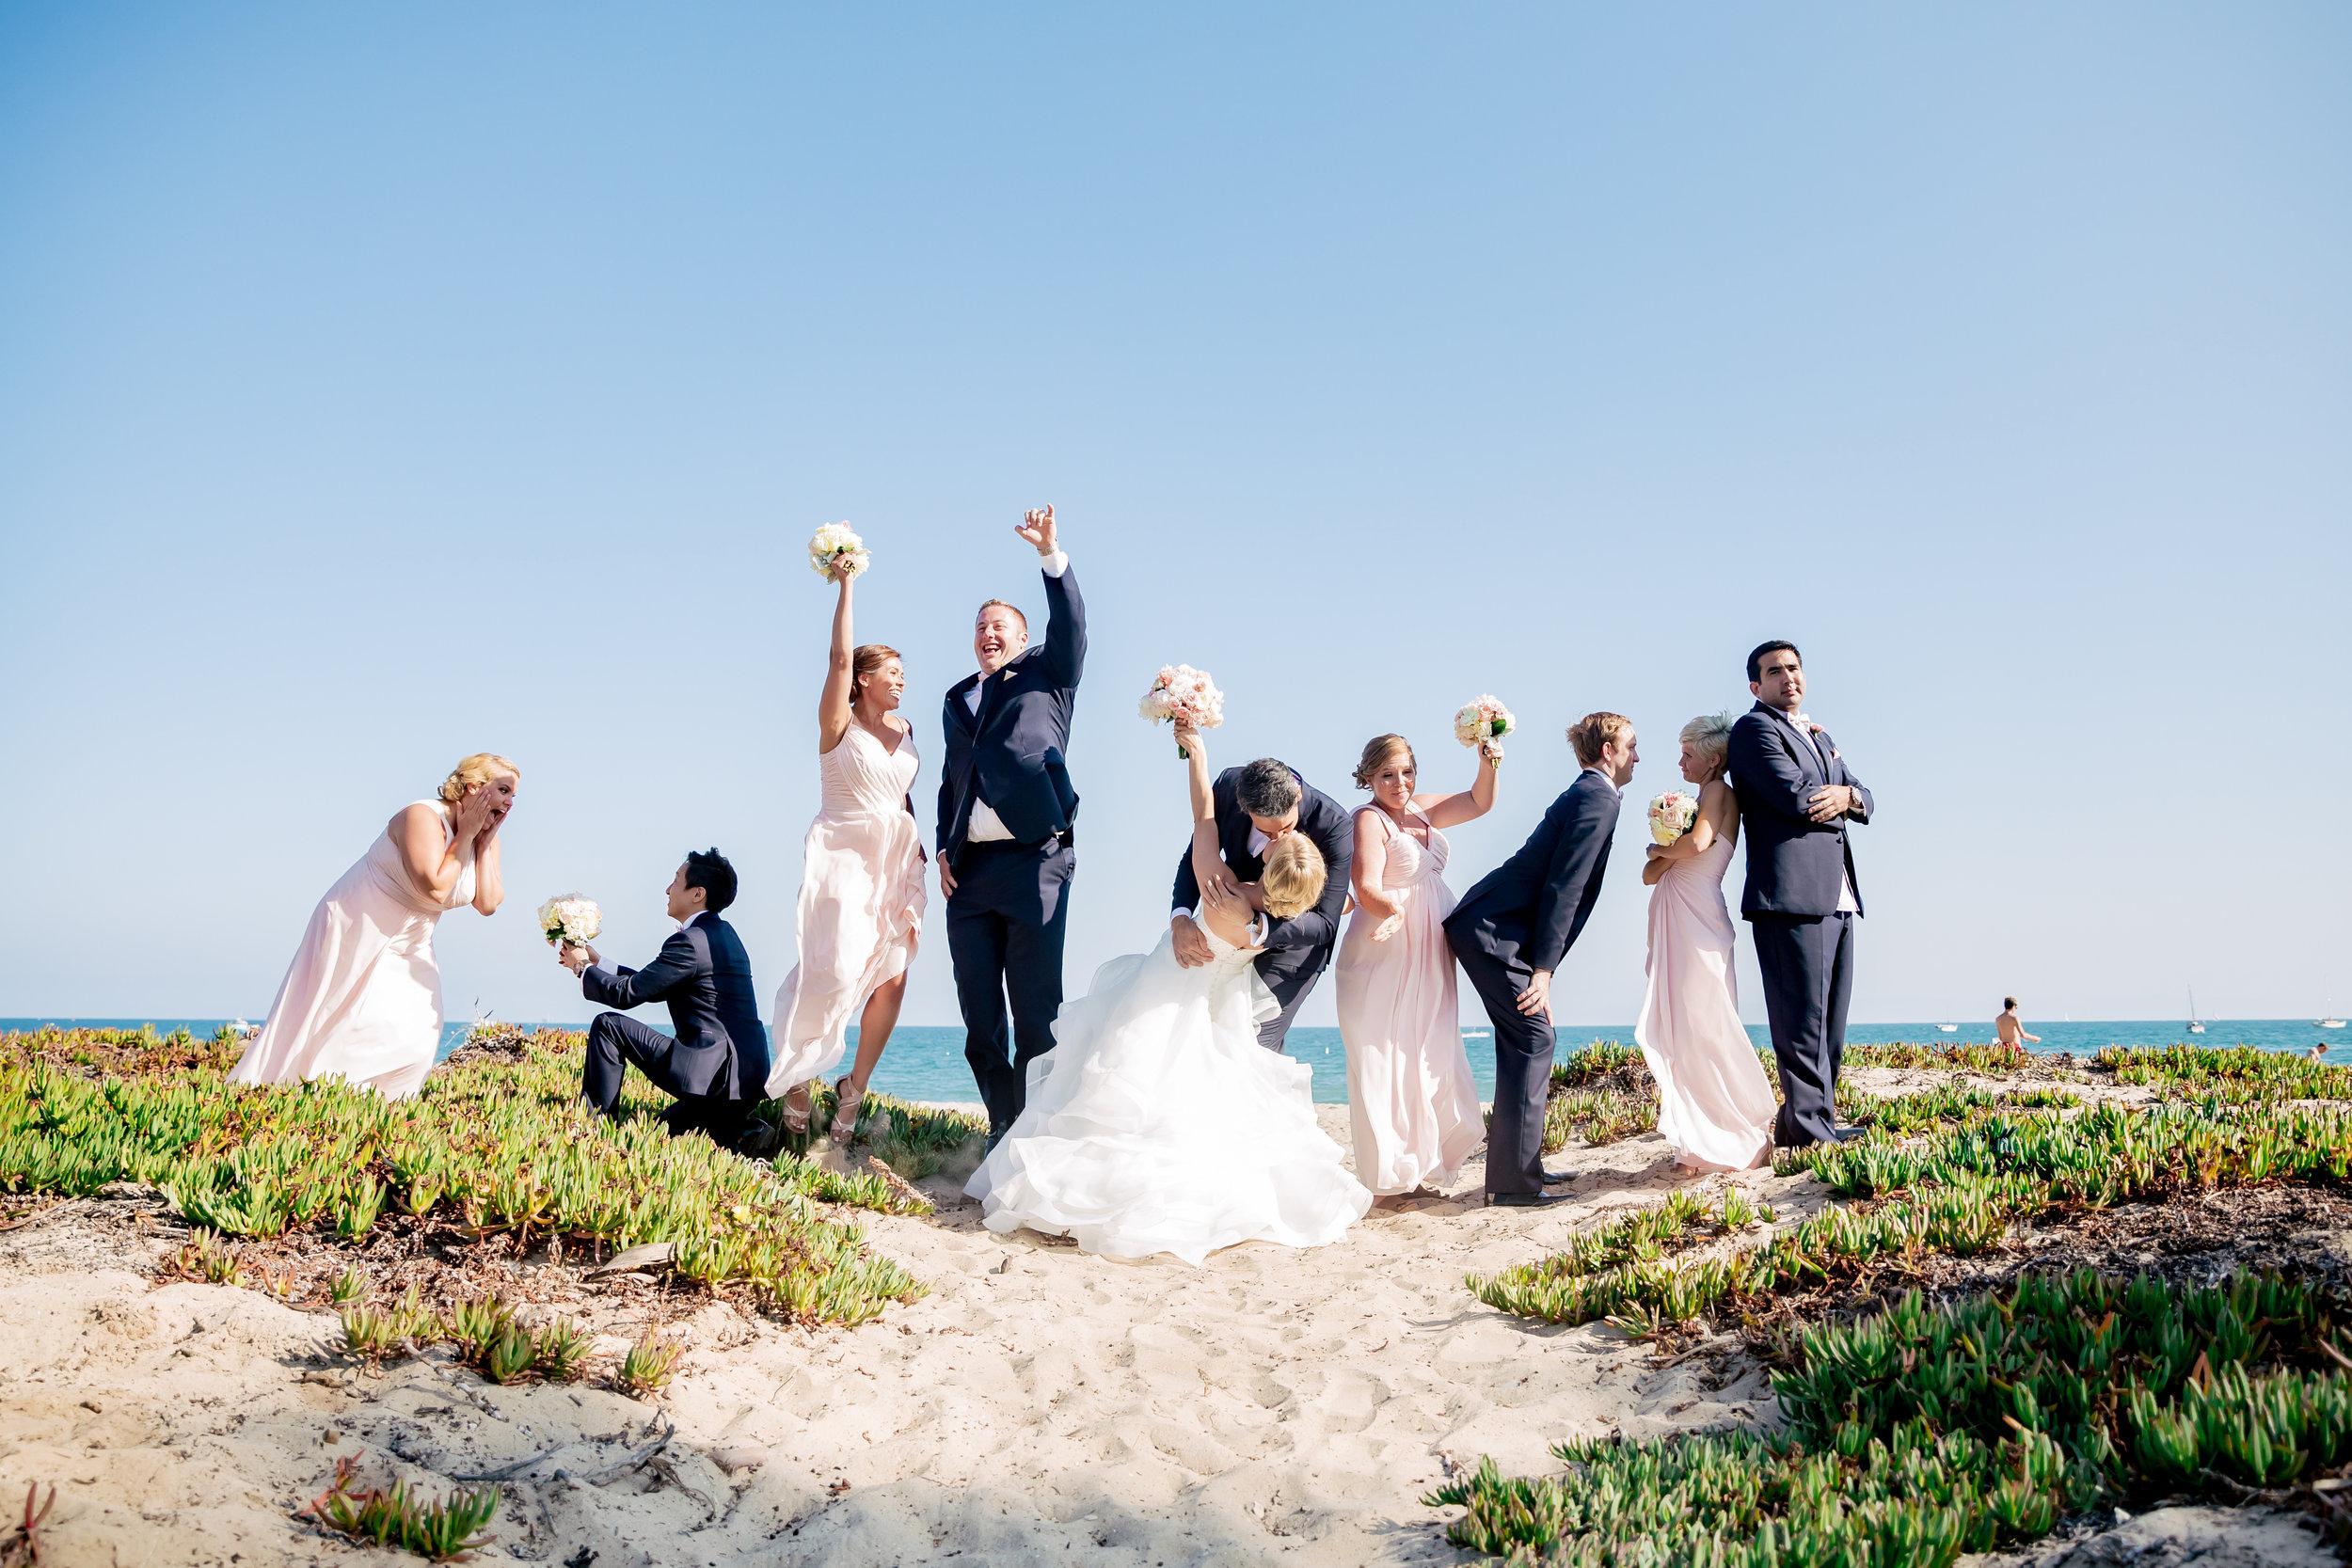 www.santabarbarawedding.com   Rewind Photography   Hilton Santa Barbara Beachfront Resort   Events by M and M   Bridal Party